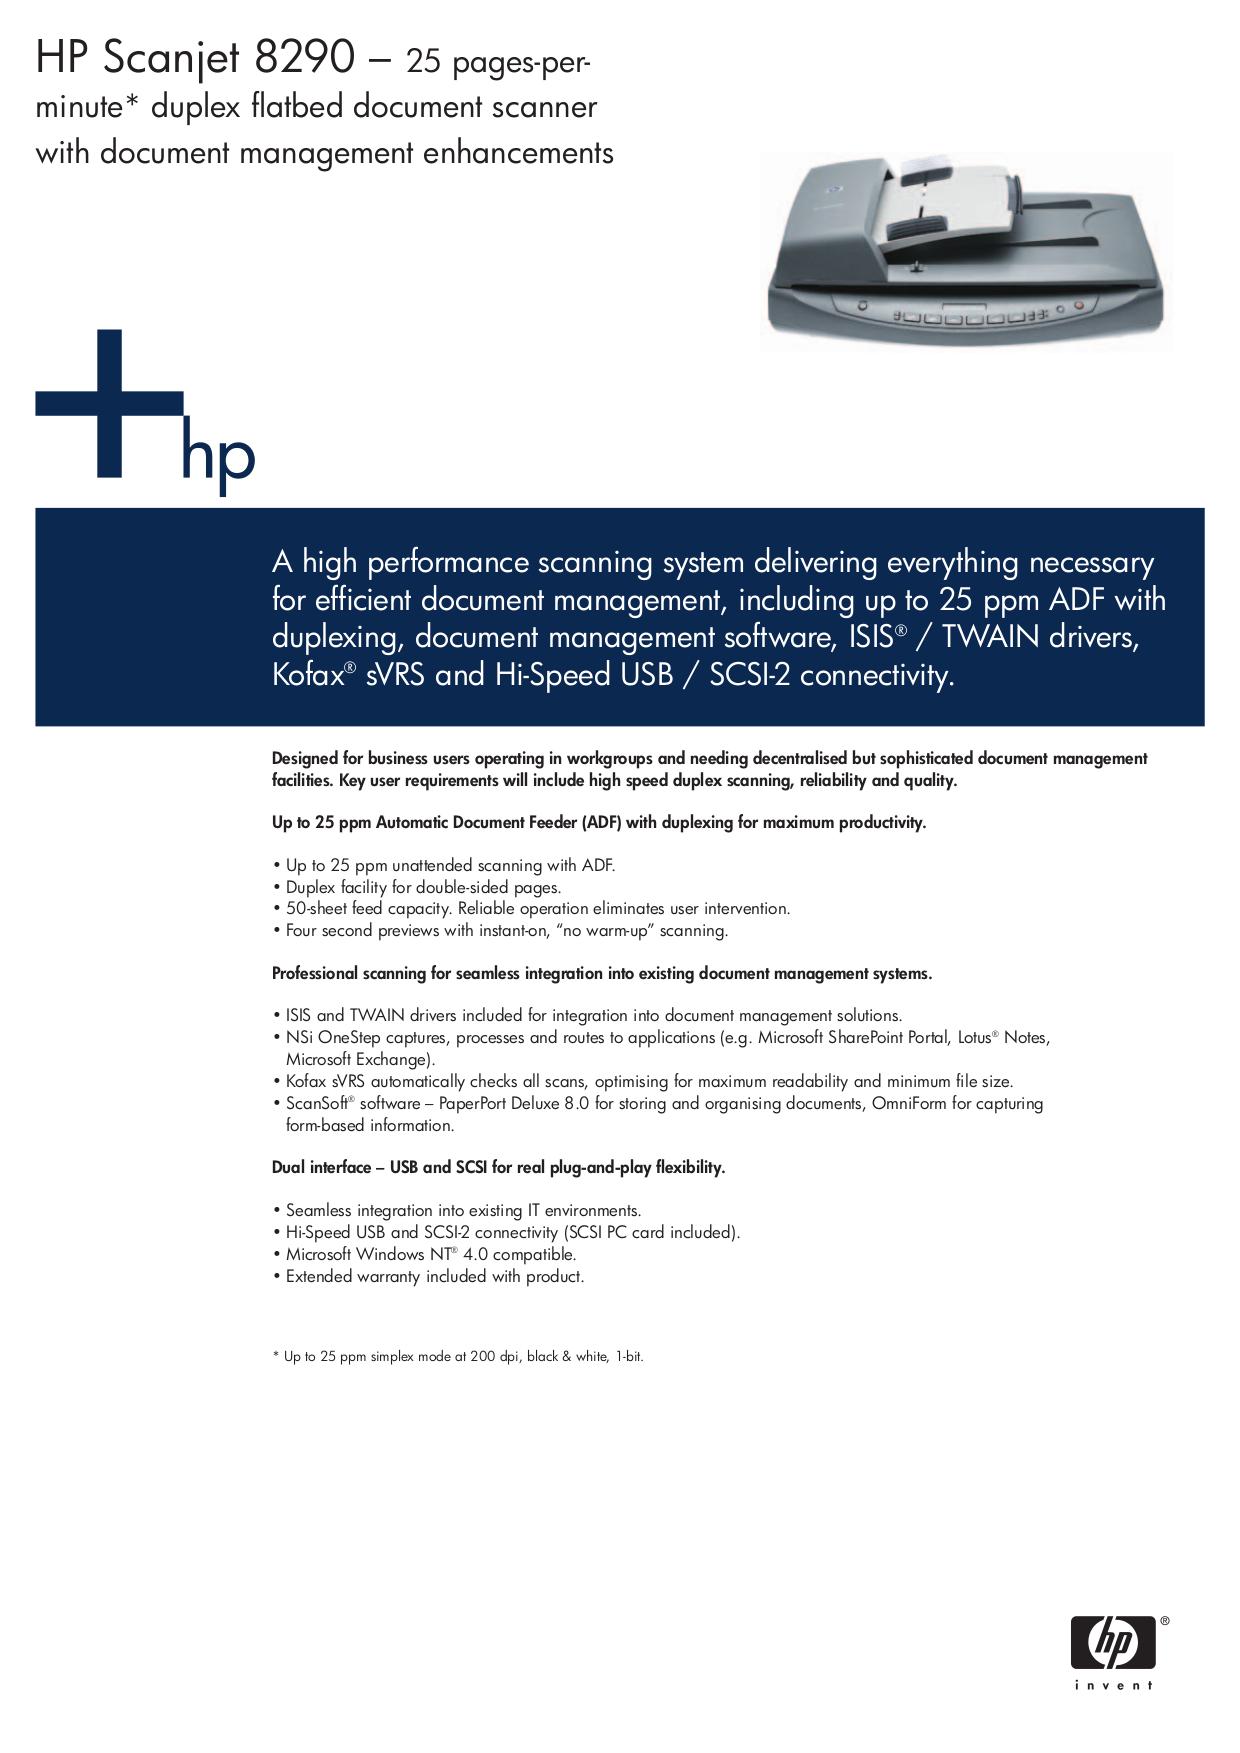 download free pdf for hp scanjet 8290 scanner manual rh umlib com HP Scanjet 5590 hp scanjet 8290 user manual